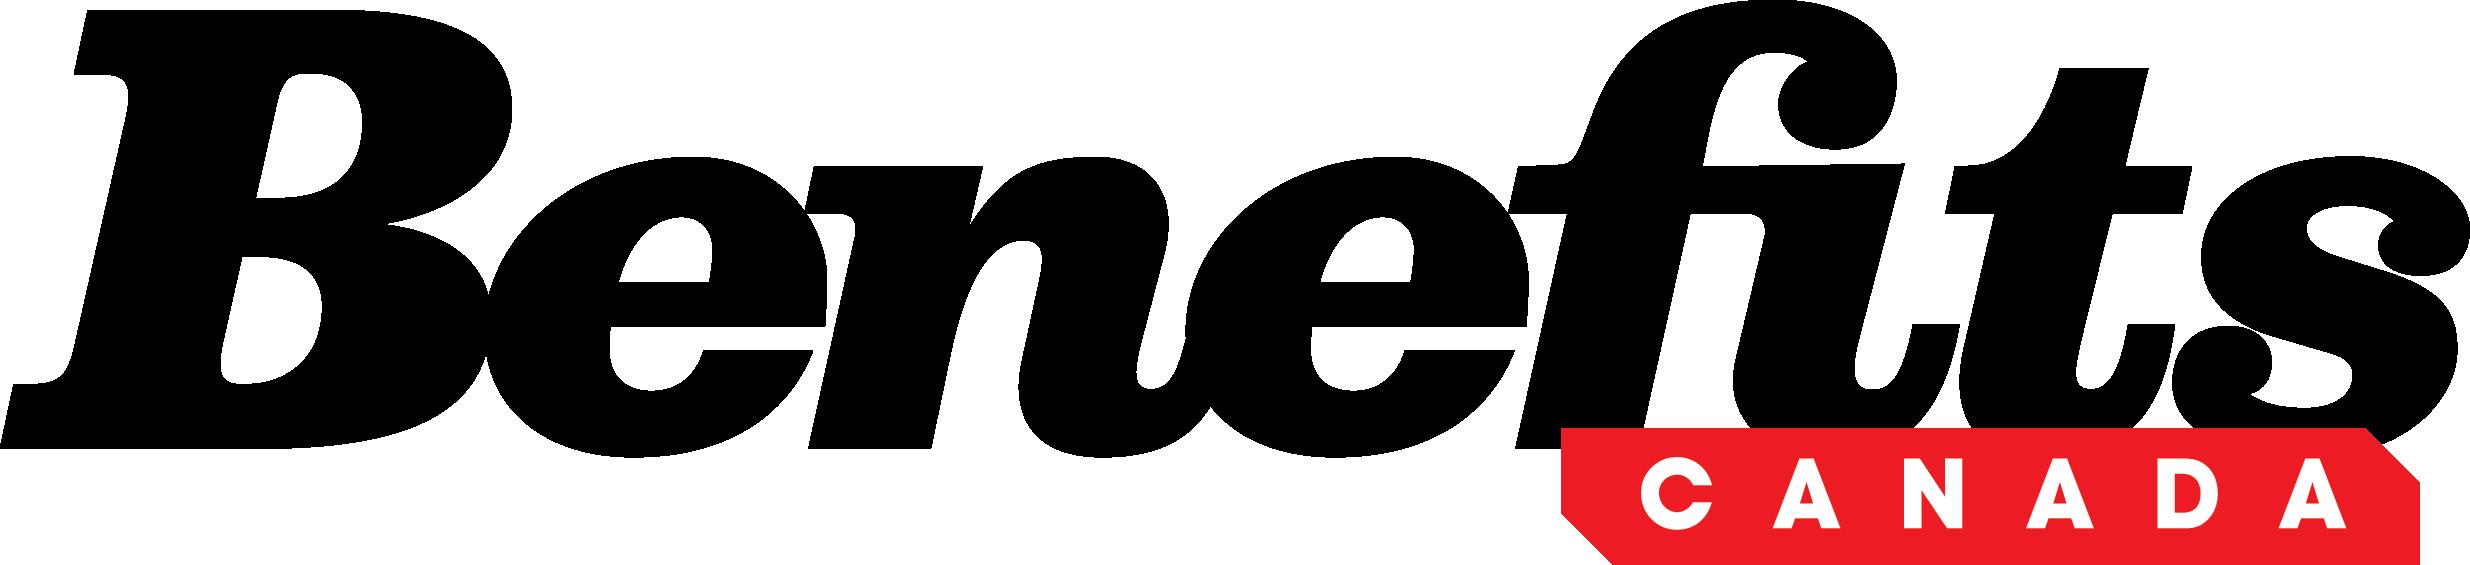 mitchell rose benefits logo